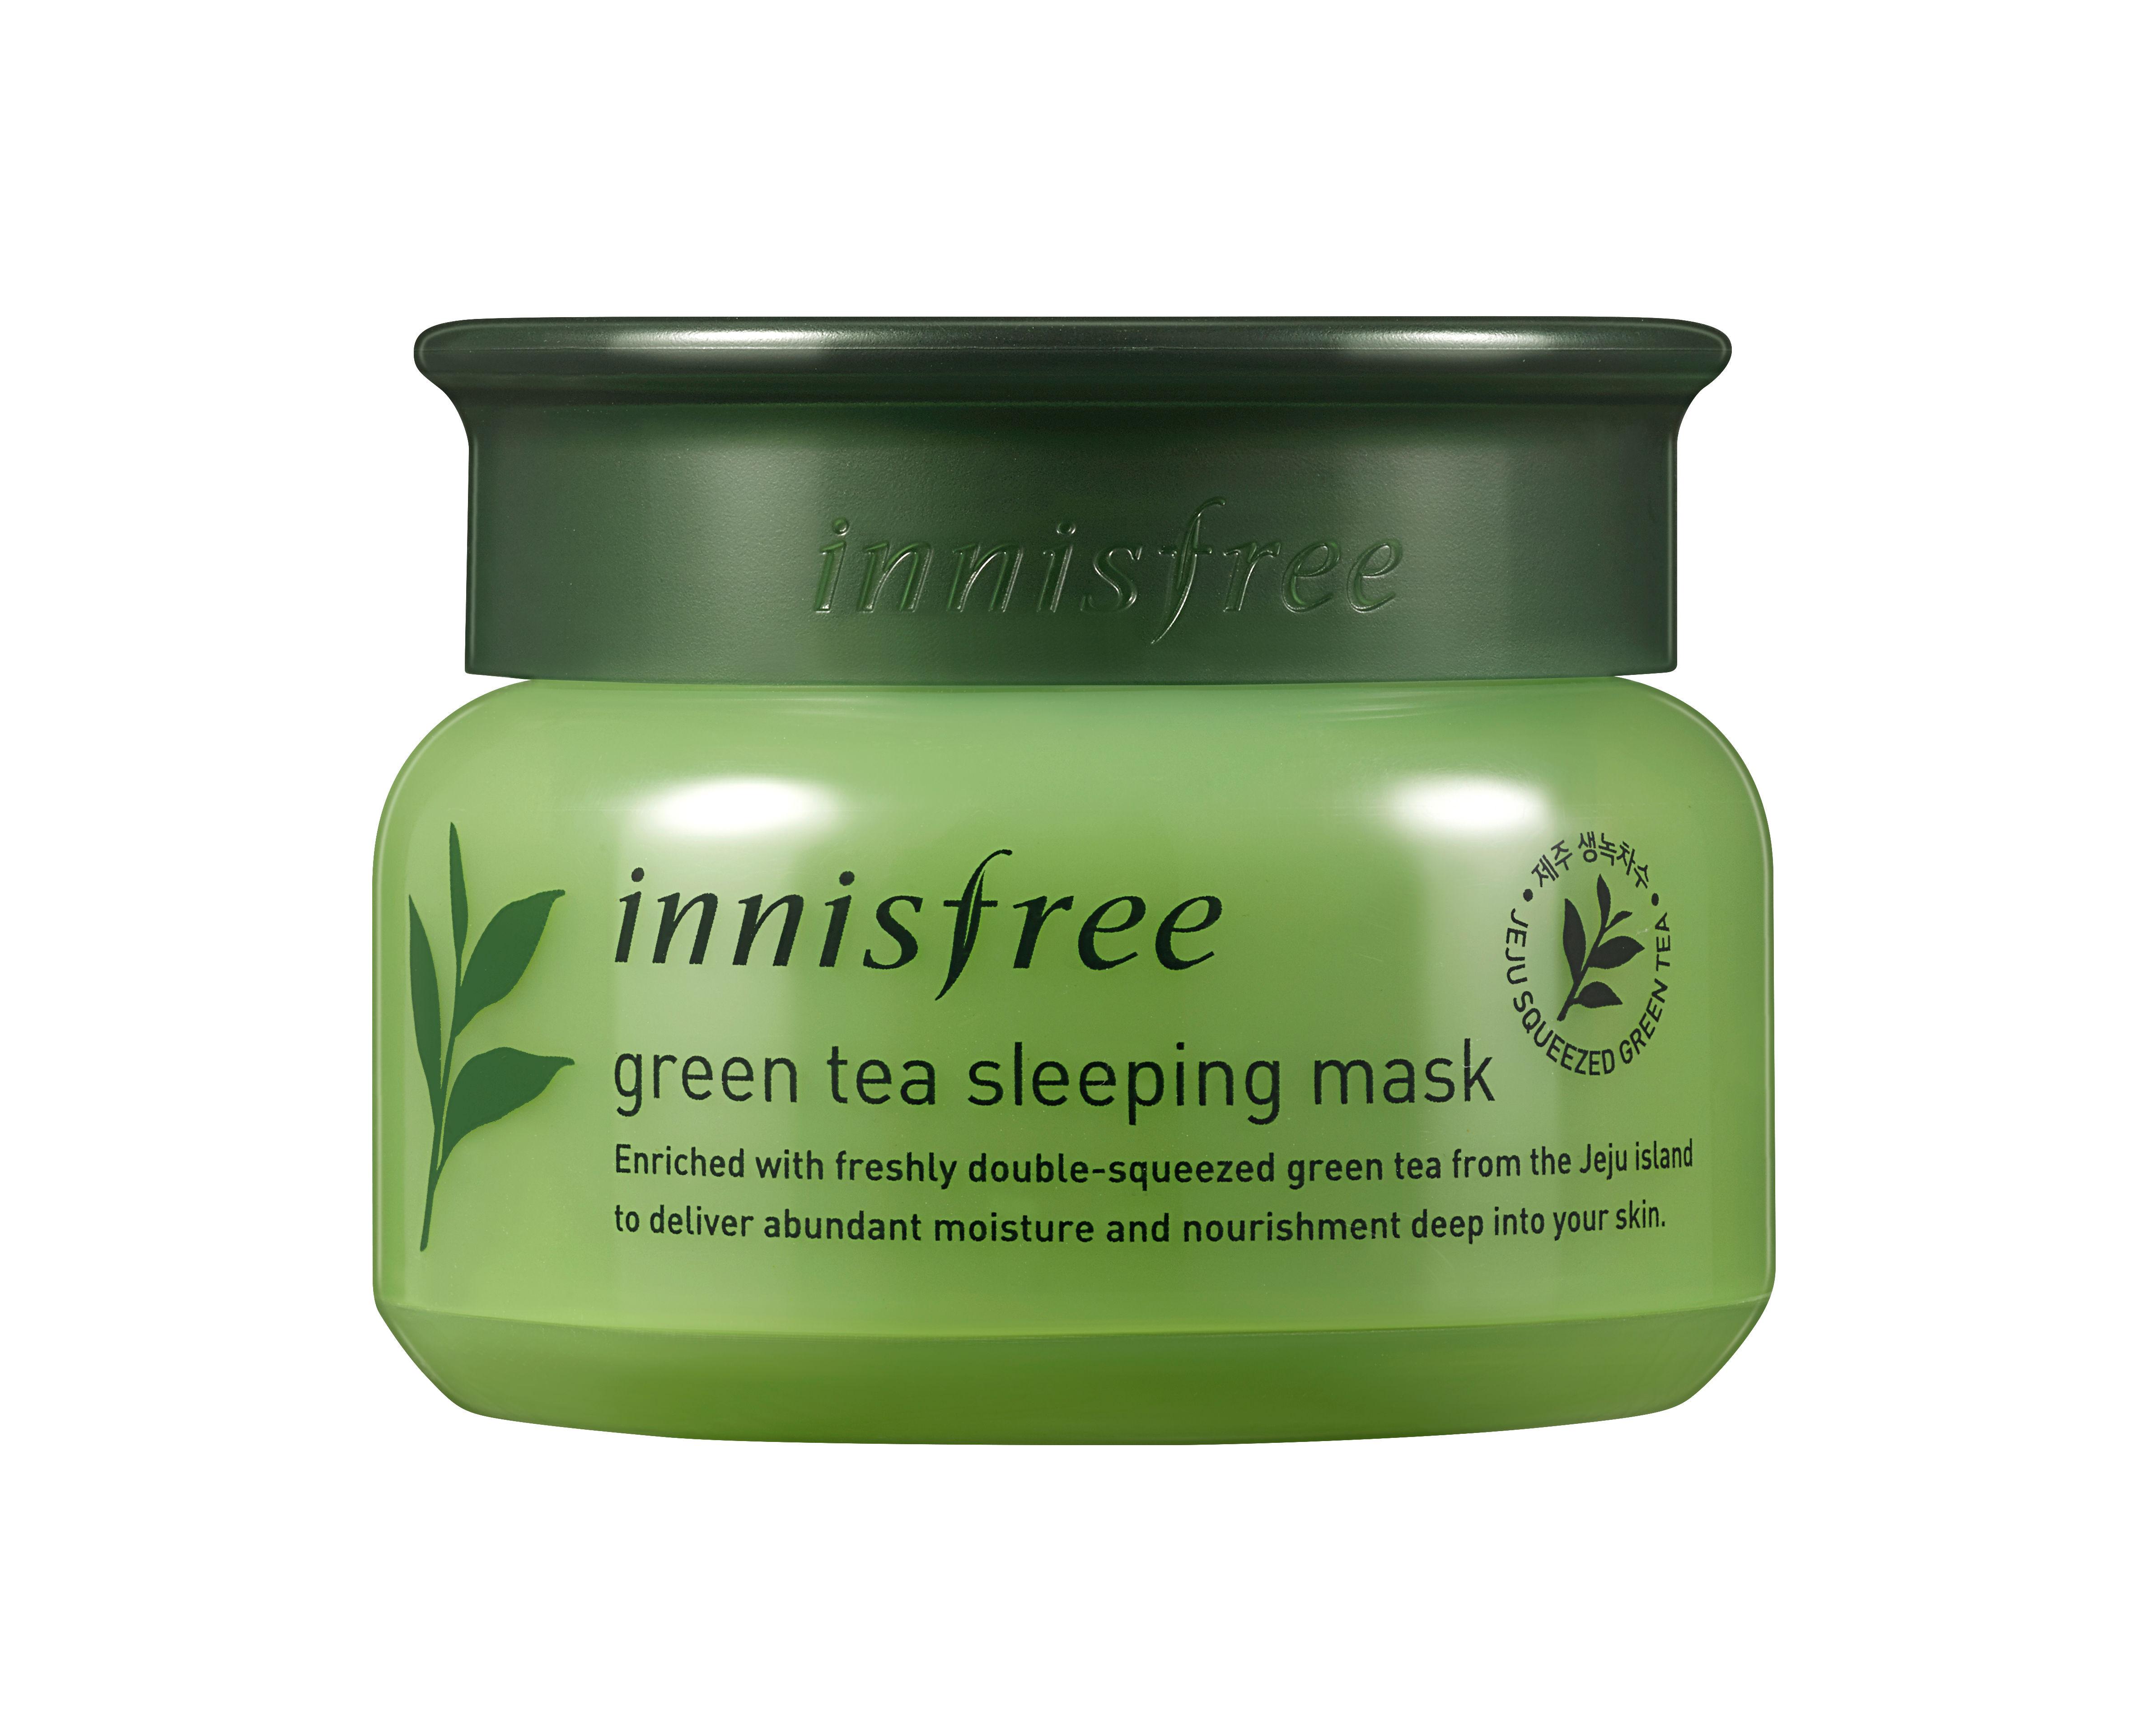 e2672951ba4 Innisfree Green Tea Sleeping Mask at Nykaa.com